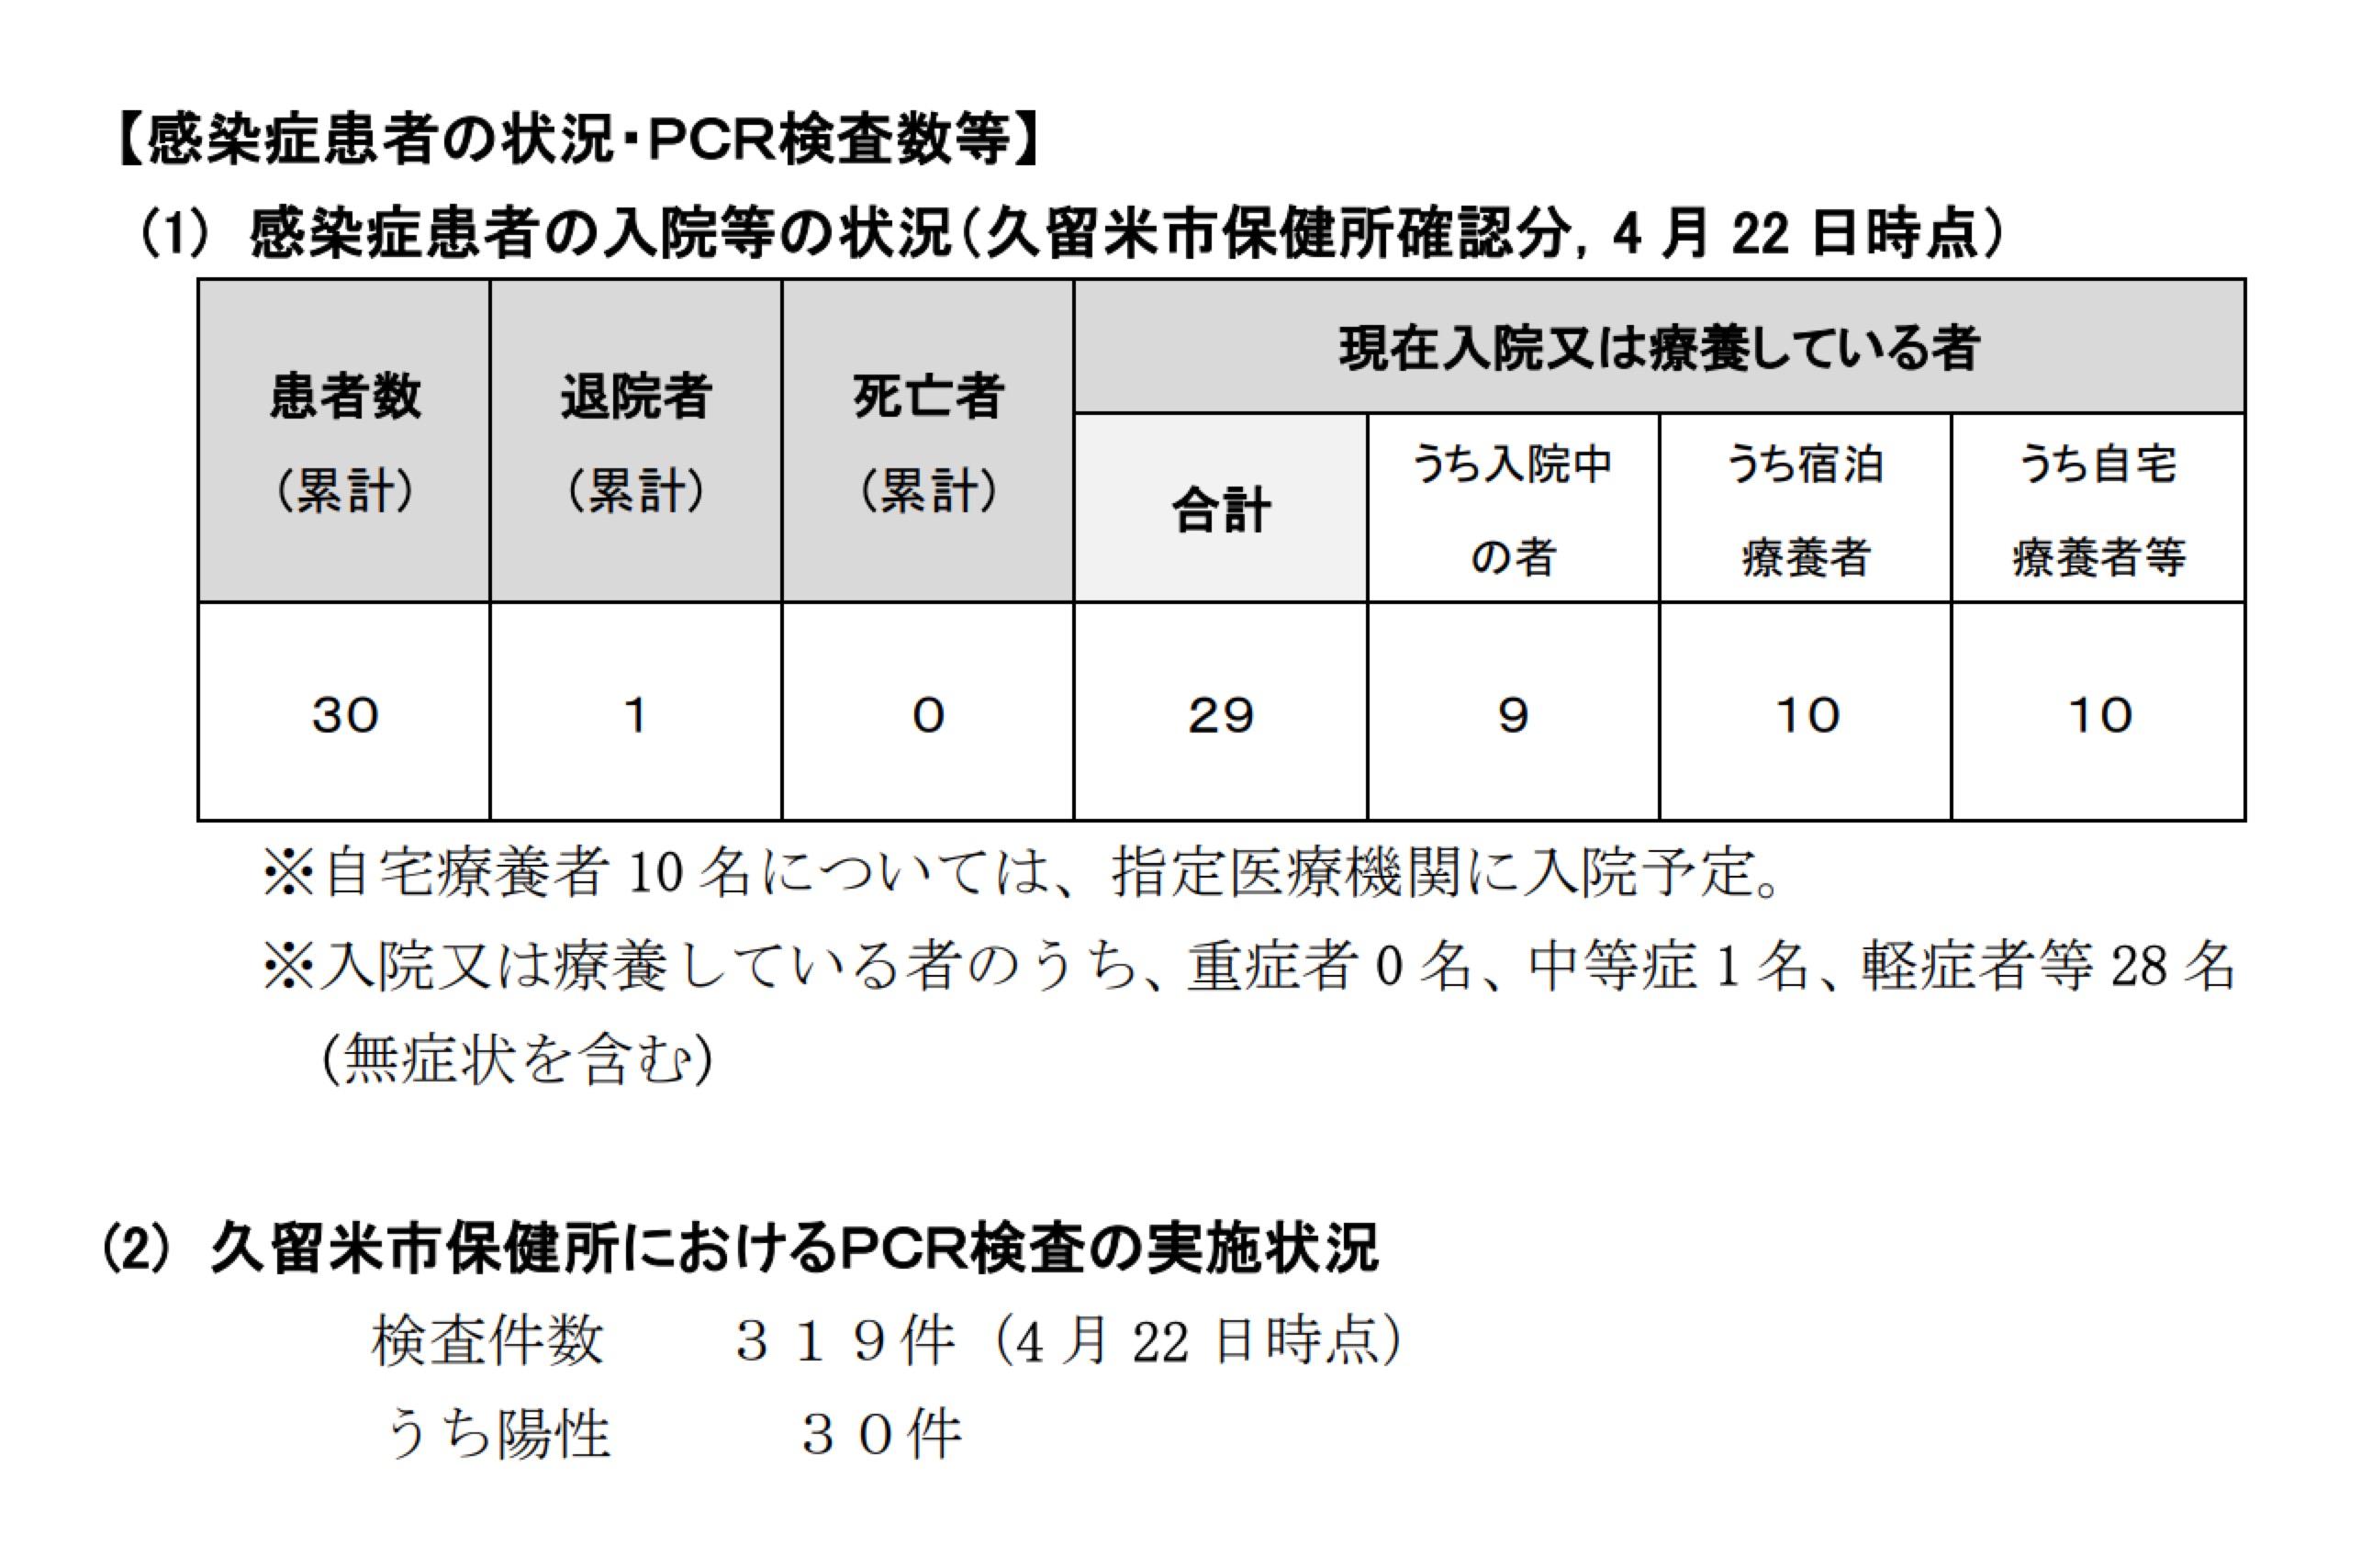 【感染症患者の状況・PCR検査数等】